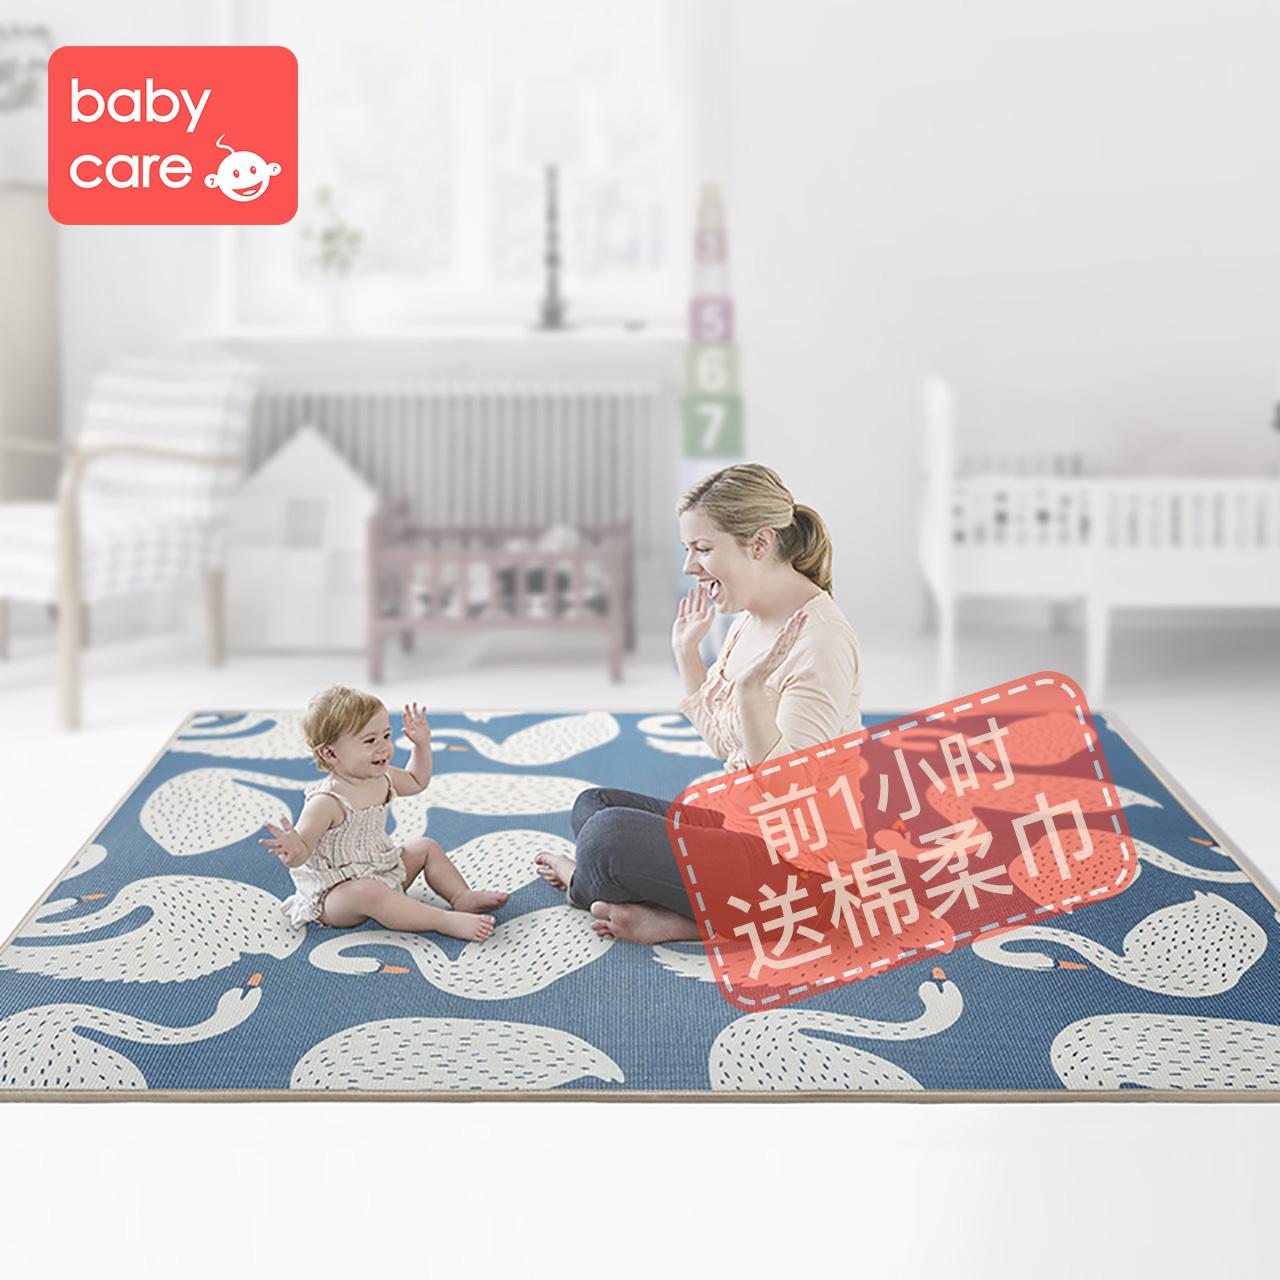 babycare宝宝爬行垫